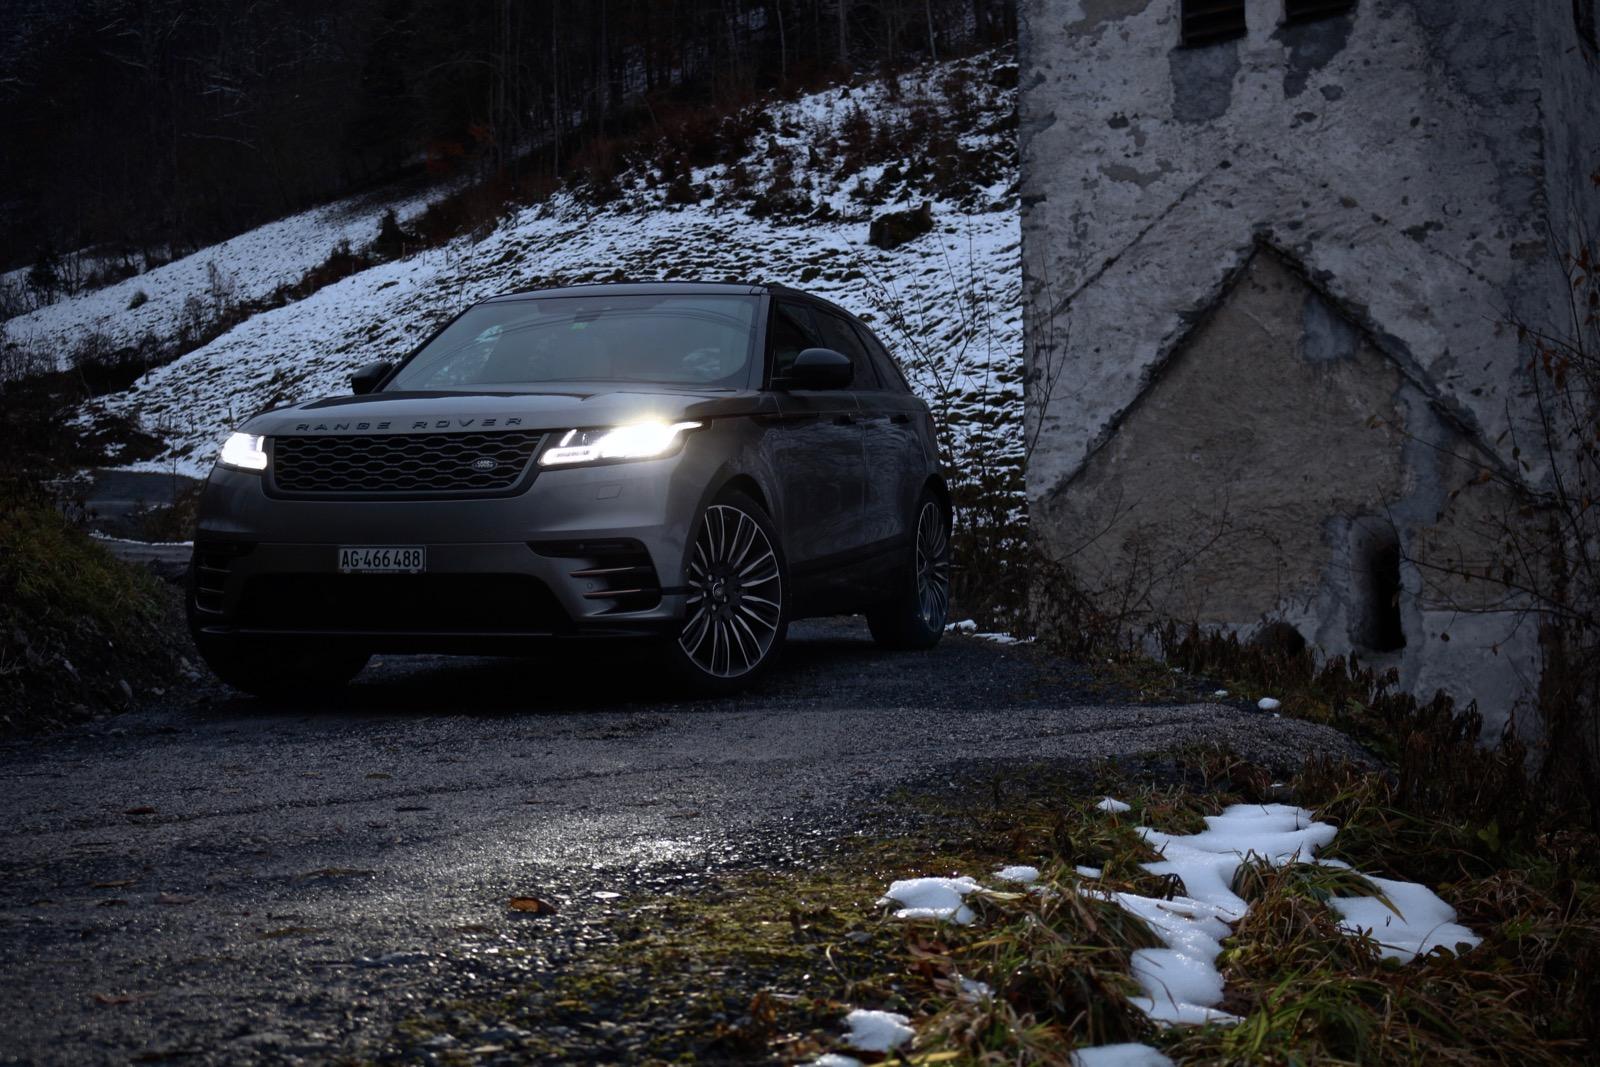 Range Rover Velar: Juwel auf Abwegen